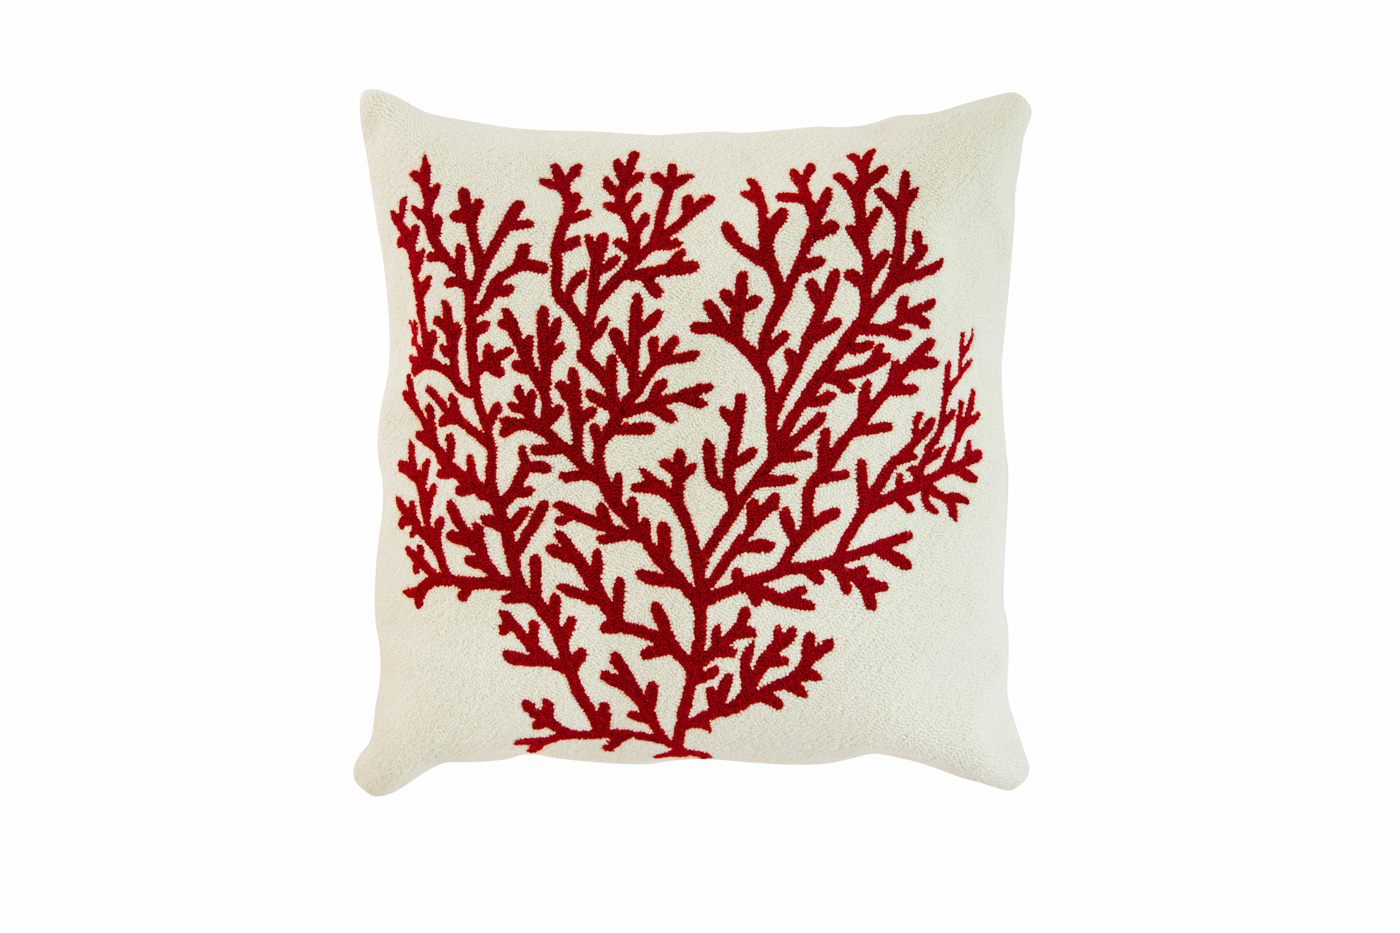 Puyao coral cushion